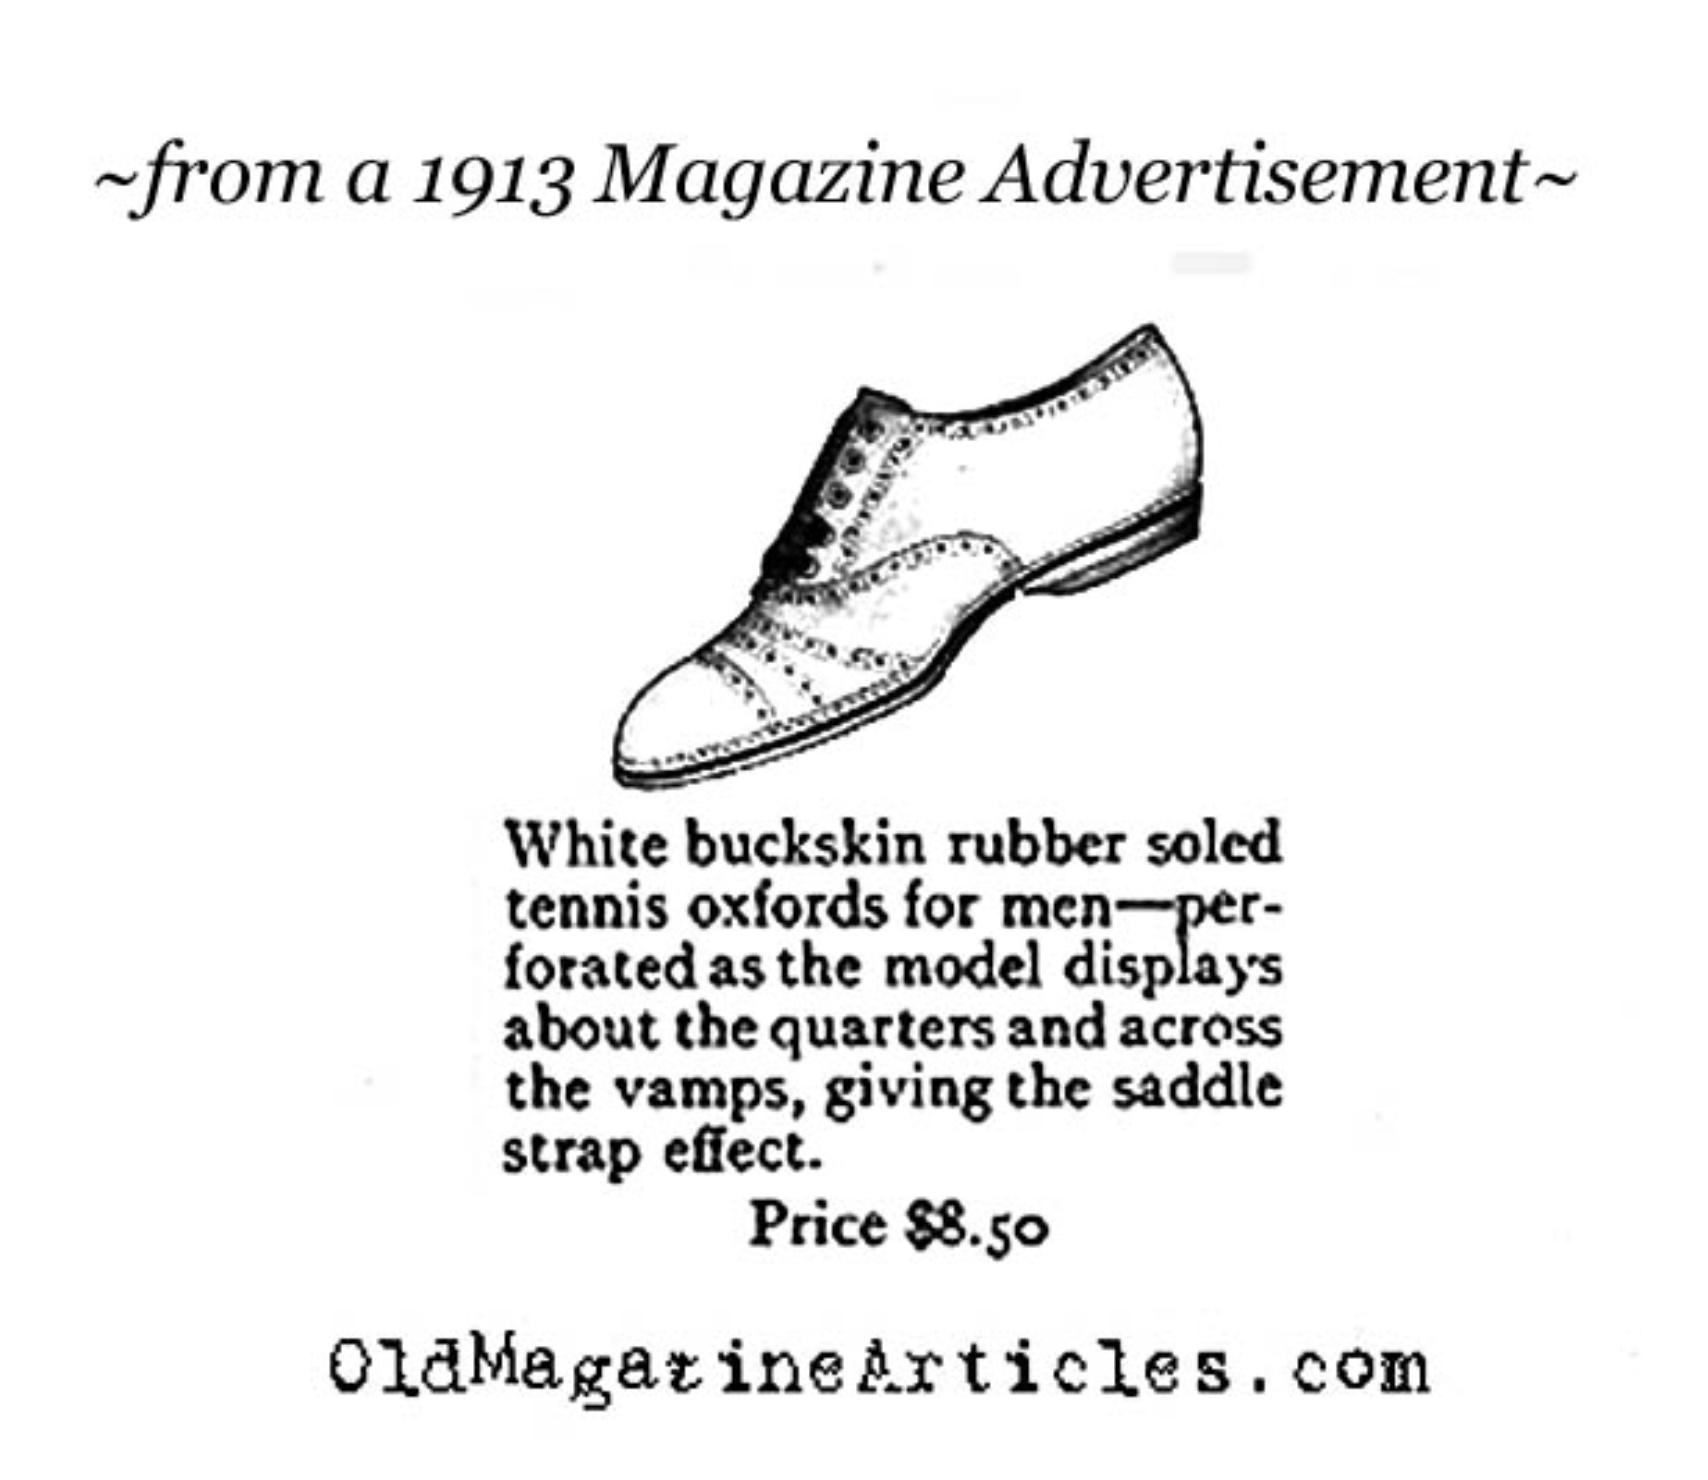 tennis shoes 1920 tennis shoes 1910 mens tennis shoes